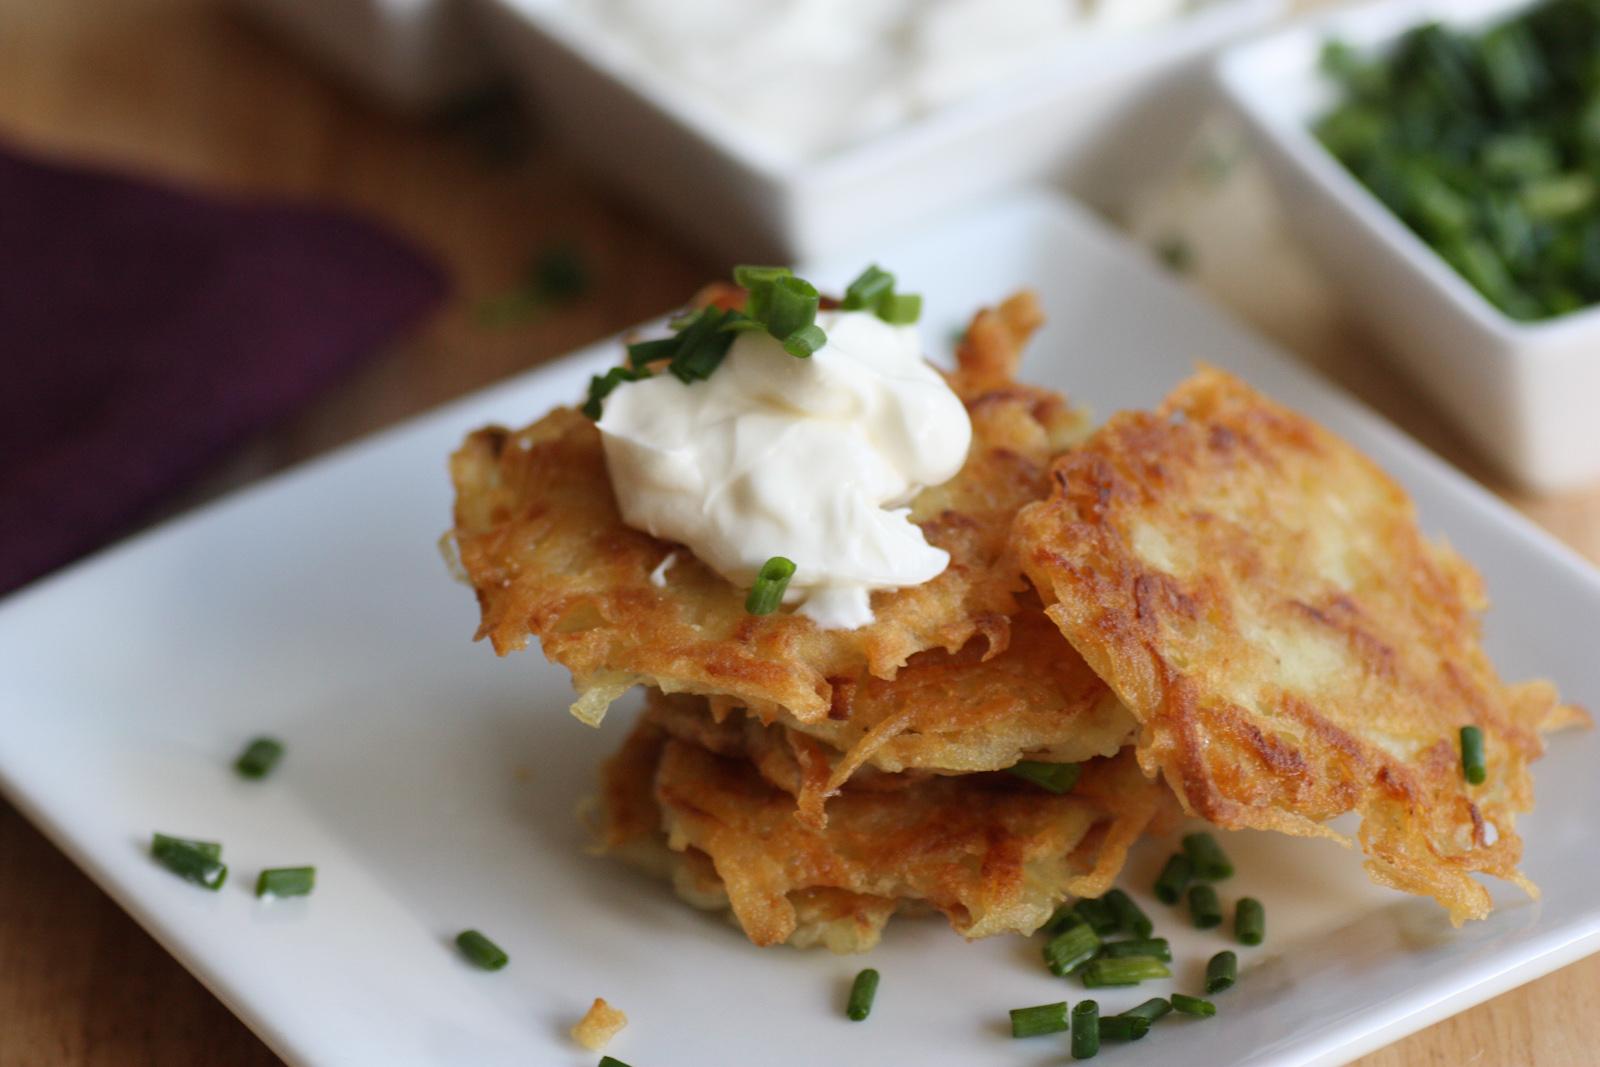 POTATO PANCAKE RECIPE (LATKES) Makes about 16 potato pancakes Total ...